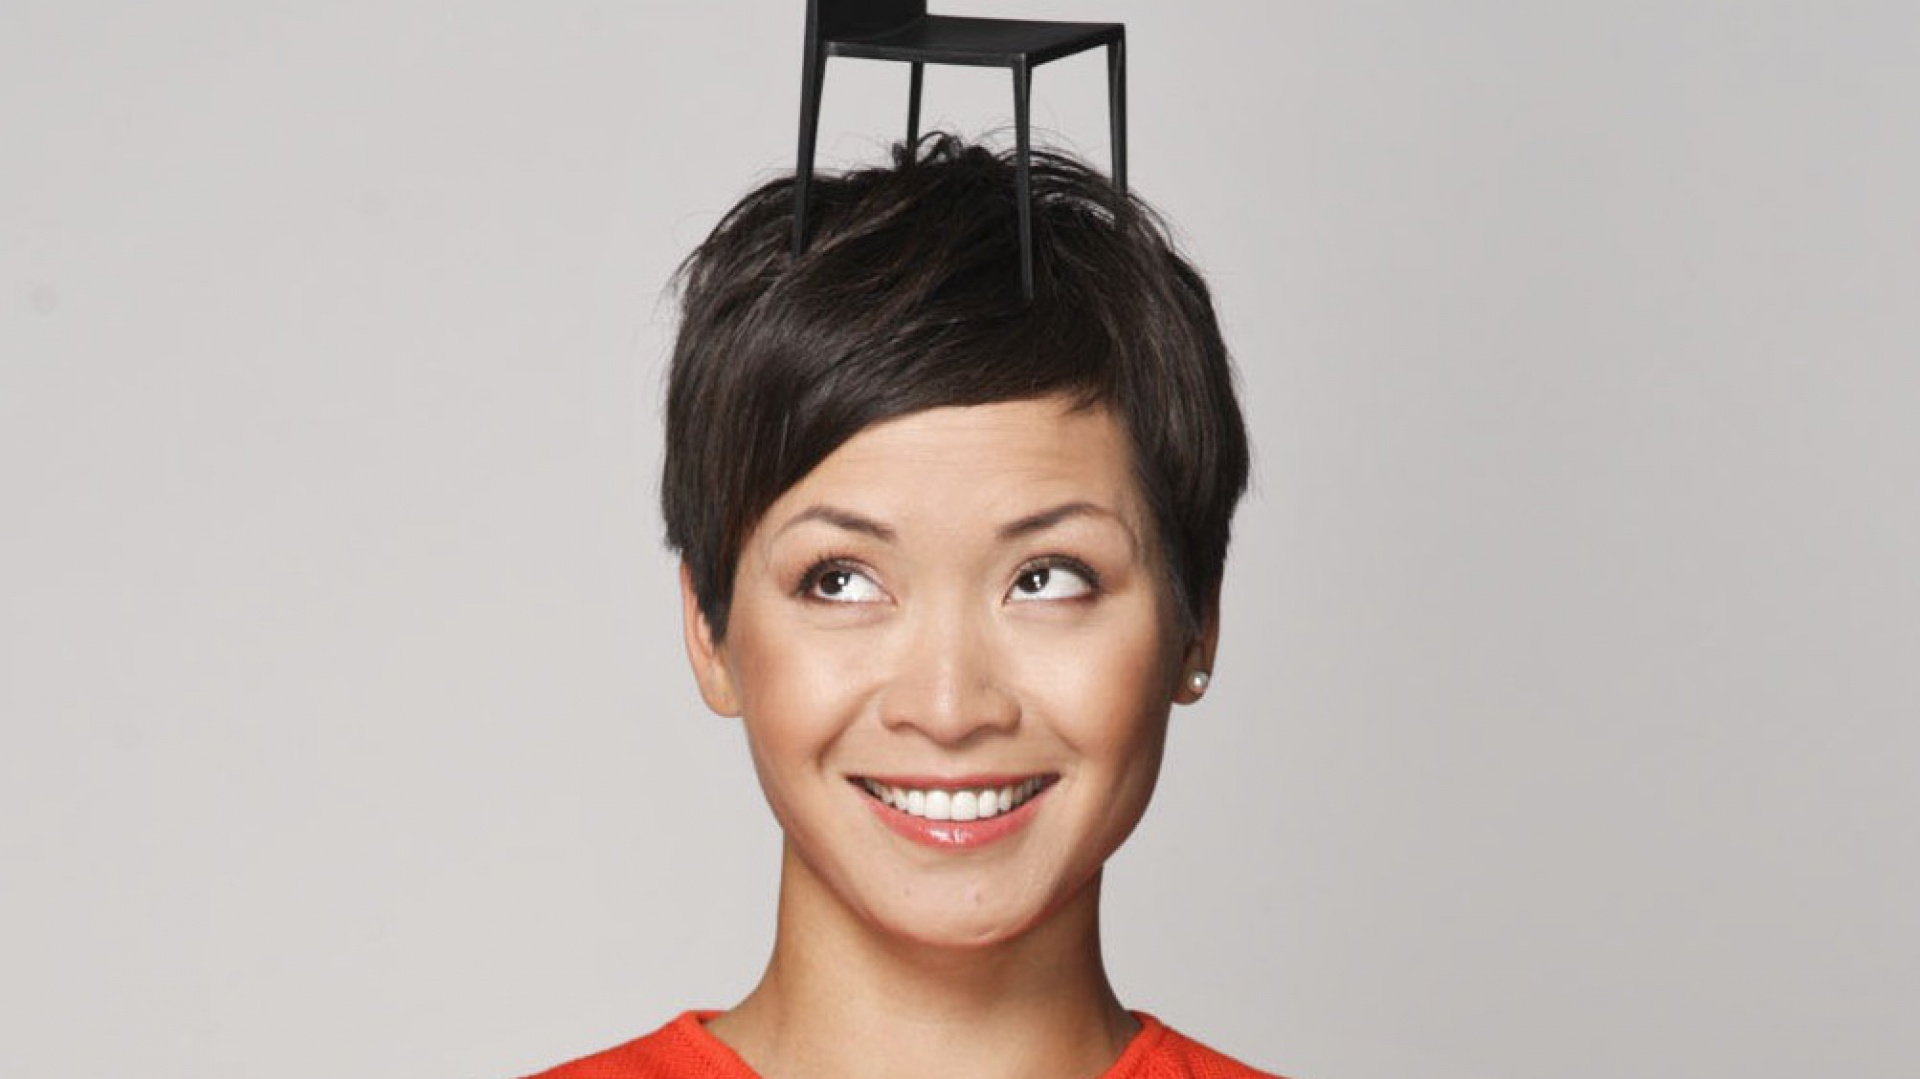 Natalia Nguyen. Fot. Materiały prasowe